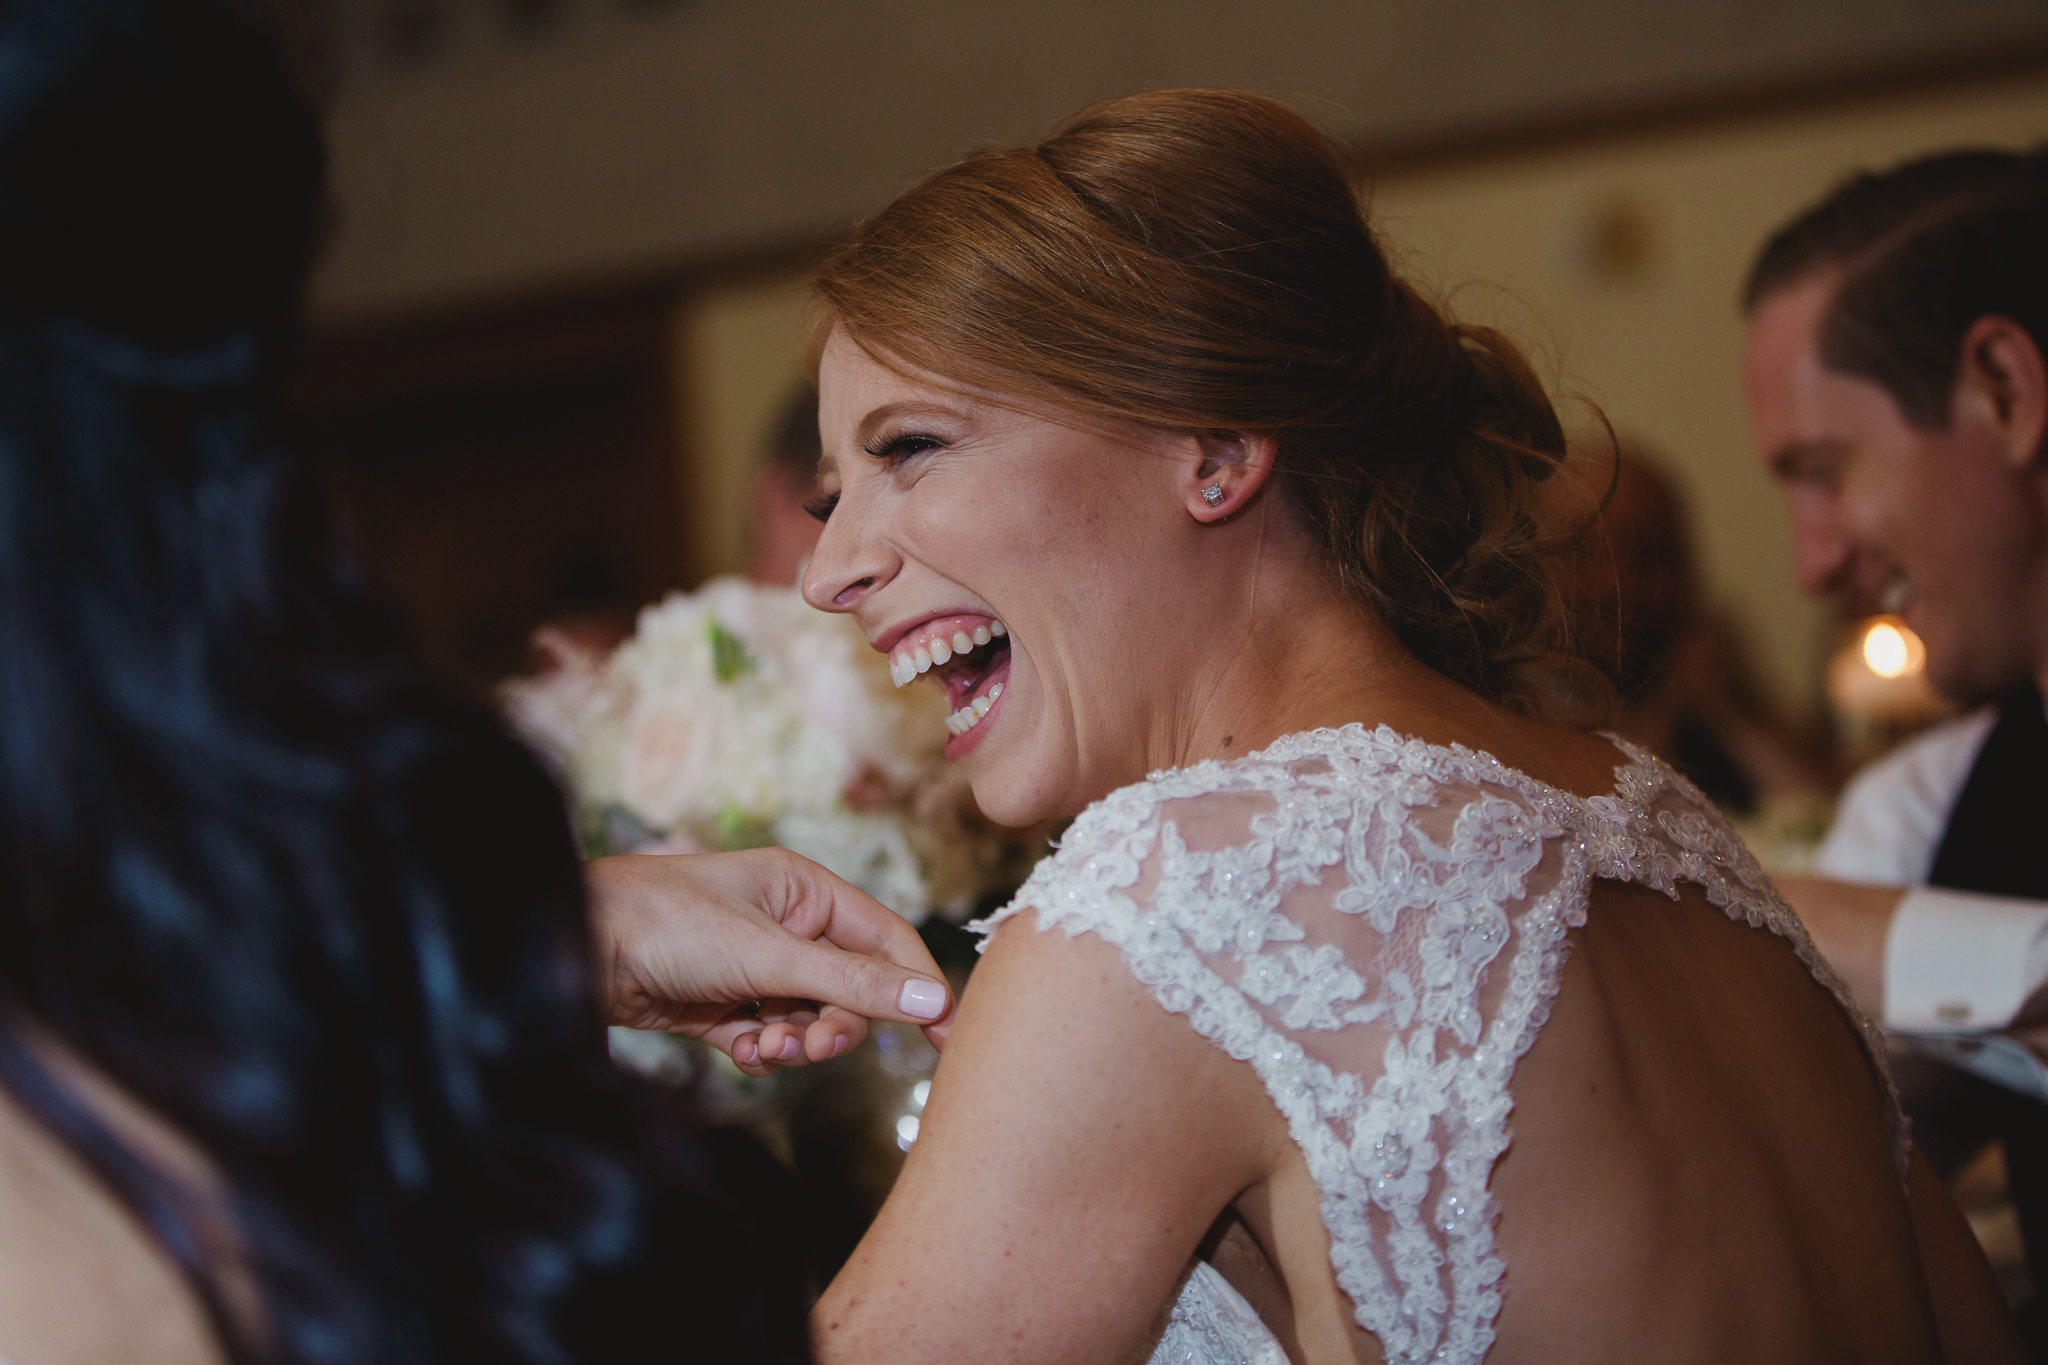 Michael and Kelly - the ashton depot - wedding DFW - wedding photographer- elizalde photography (110 of 150).jpg